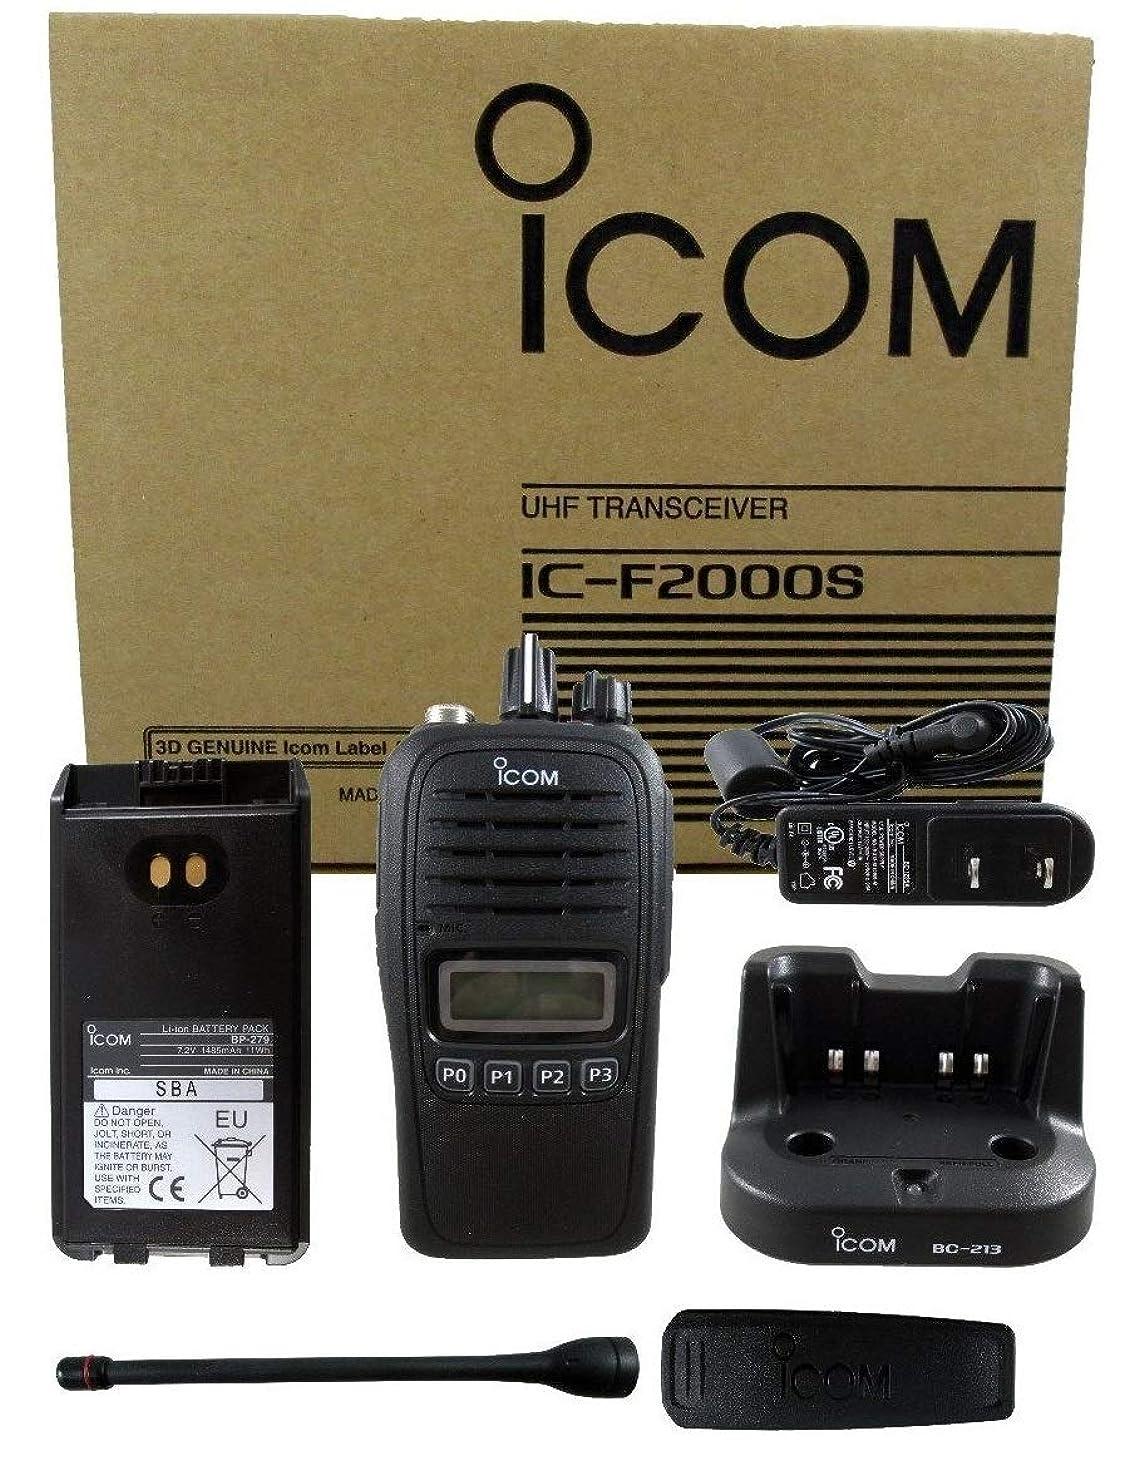 Icom F2000S 05 4W 128CH UHF 400-470MHZ Radio Police Fire HAM Submersible LCD